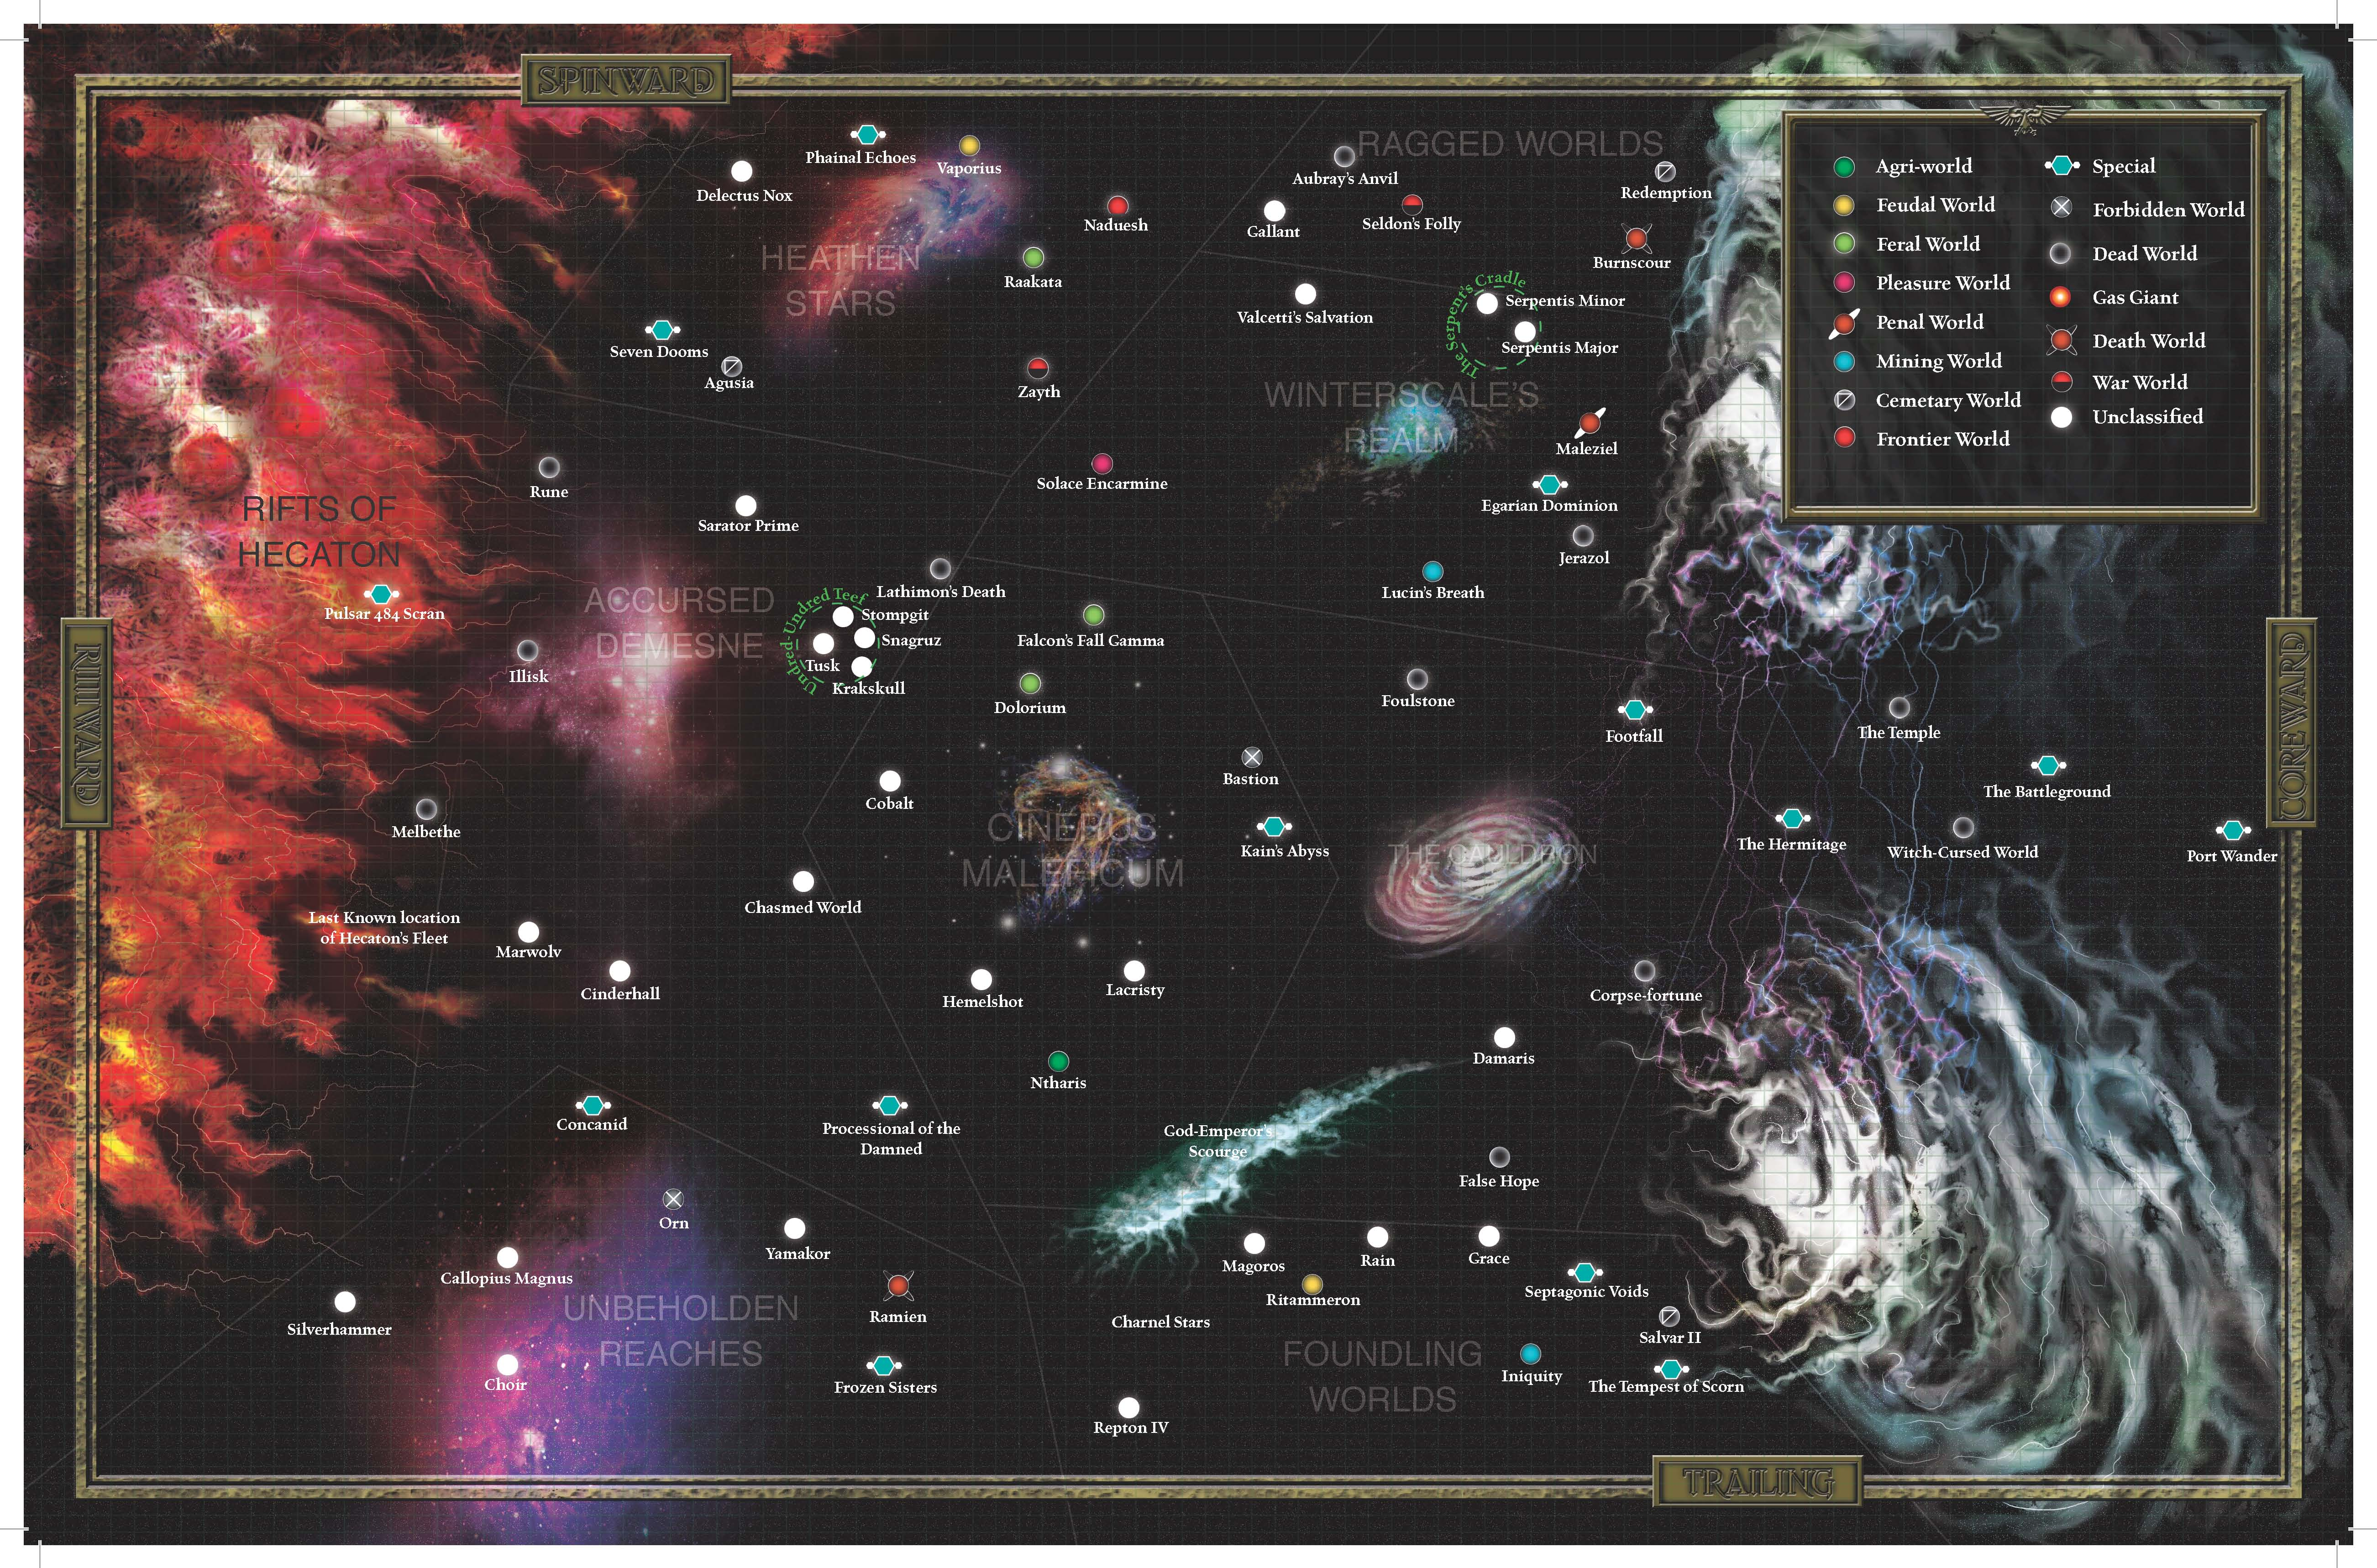 http://www.fantasyflightgames.com/ffg_content/rogue-trader/support/images/Koronus%20Expanse%20Map%20(jpg).jpg